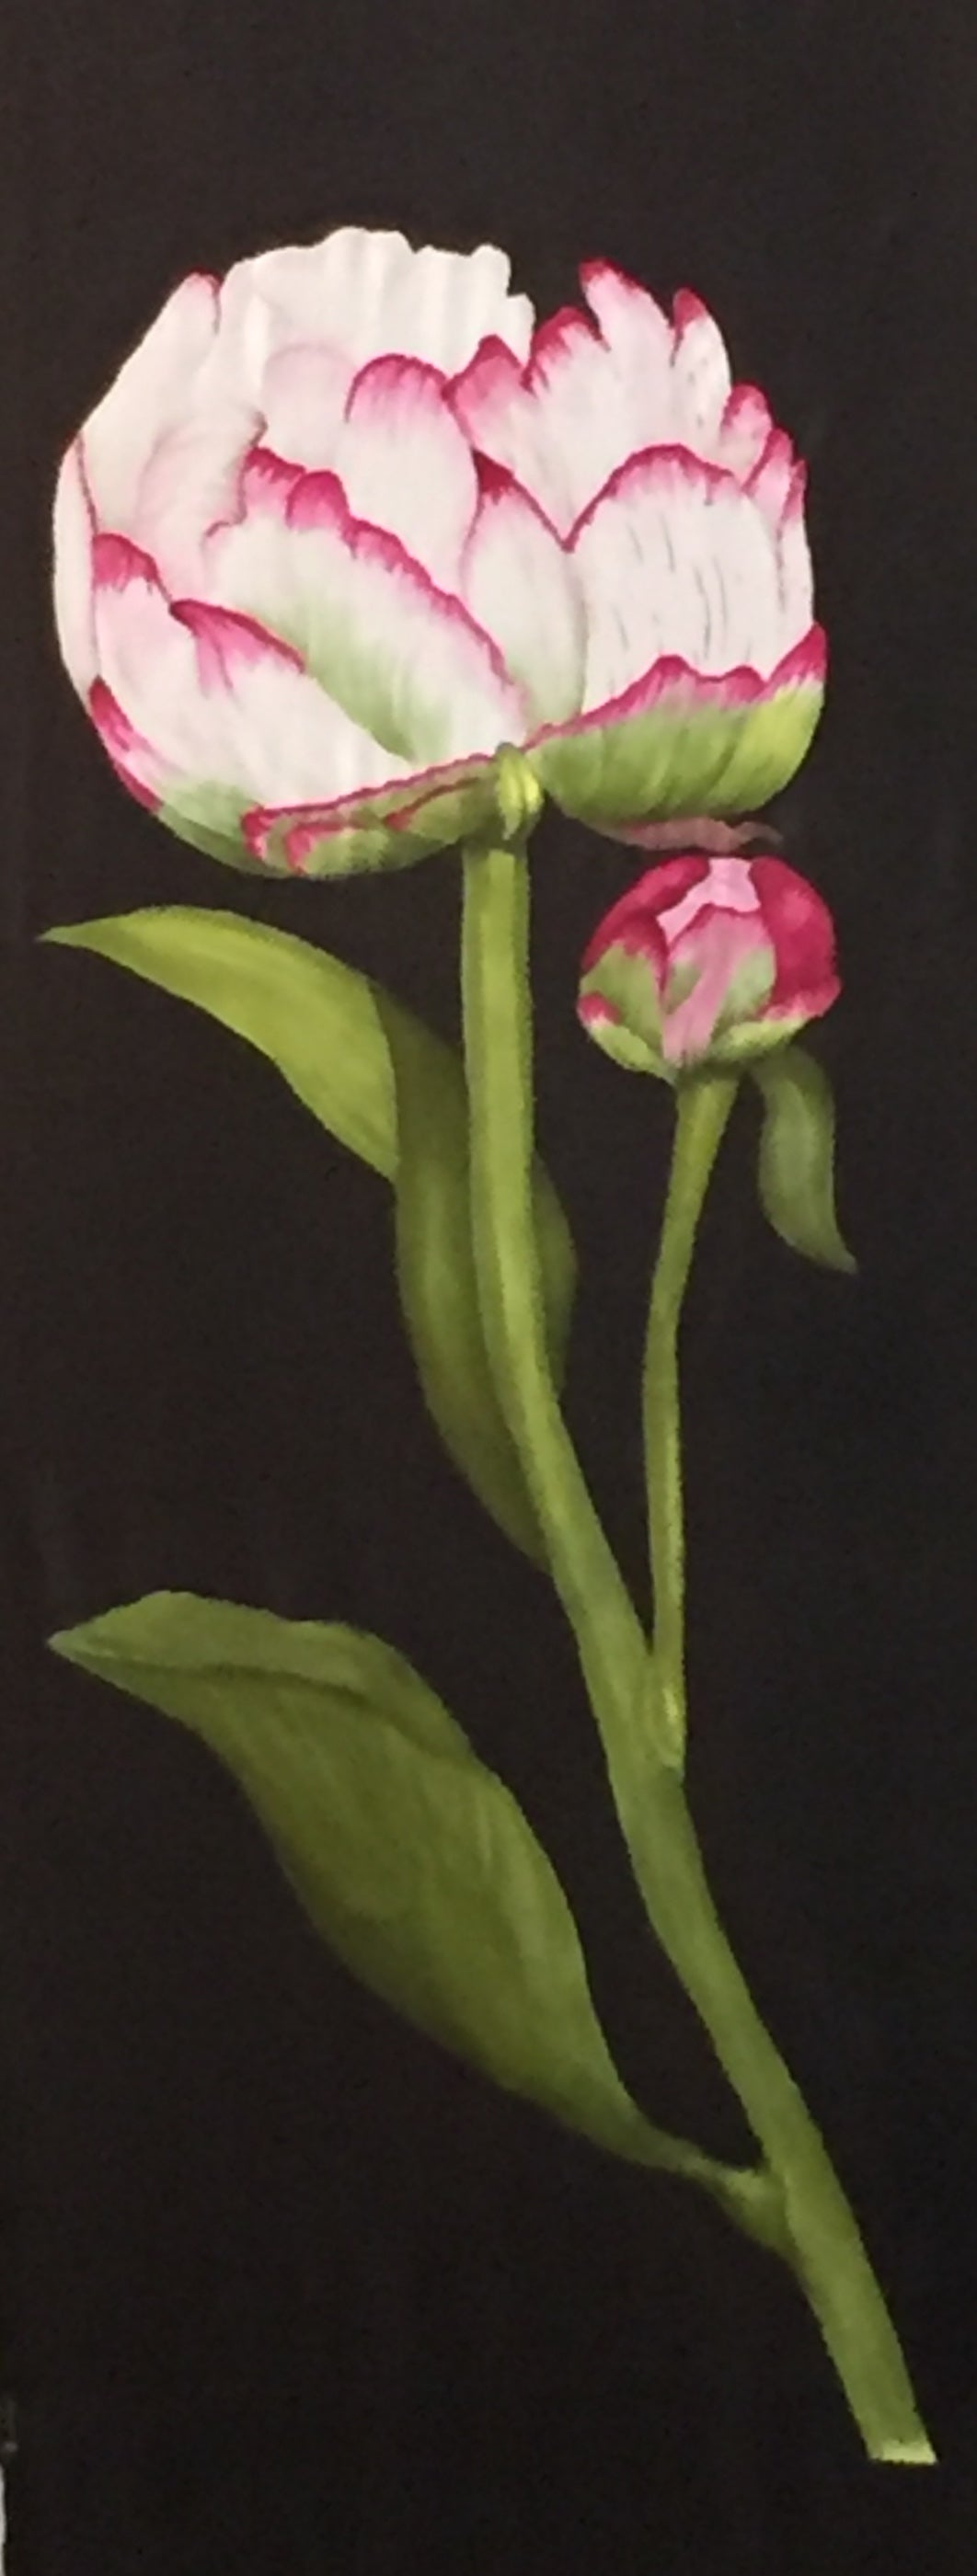 Image of Peony and bud on black background